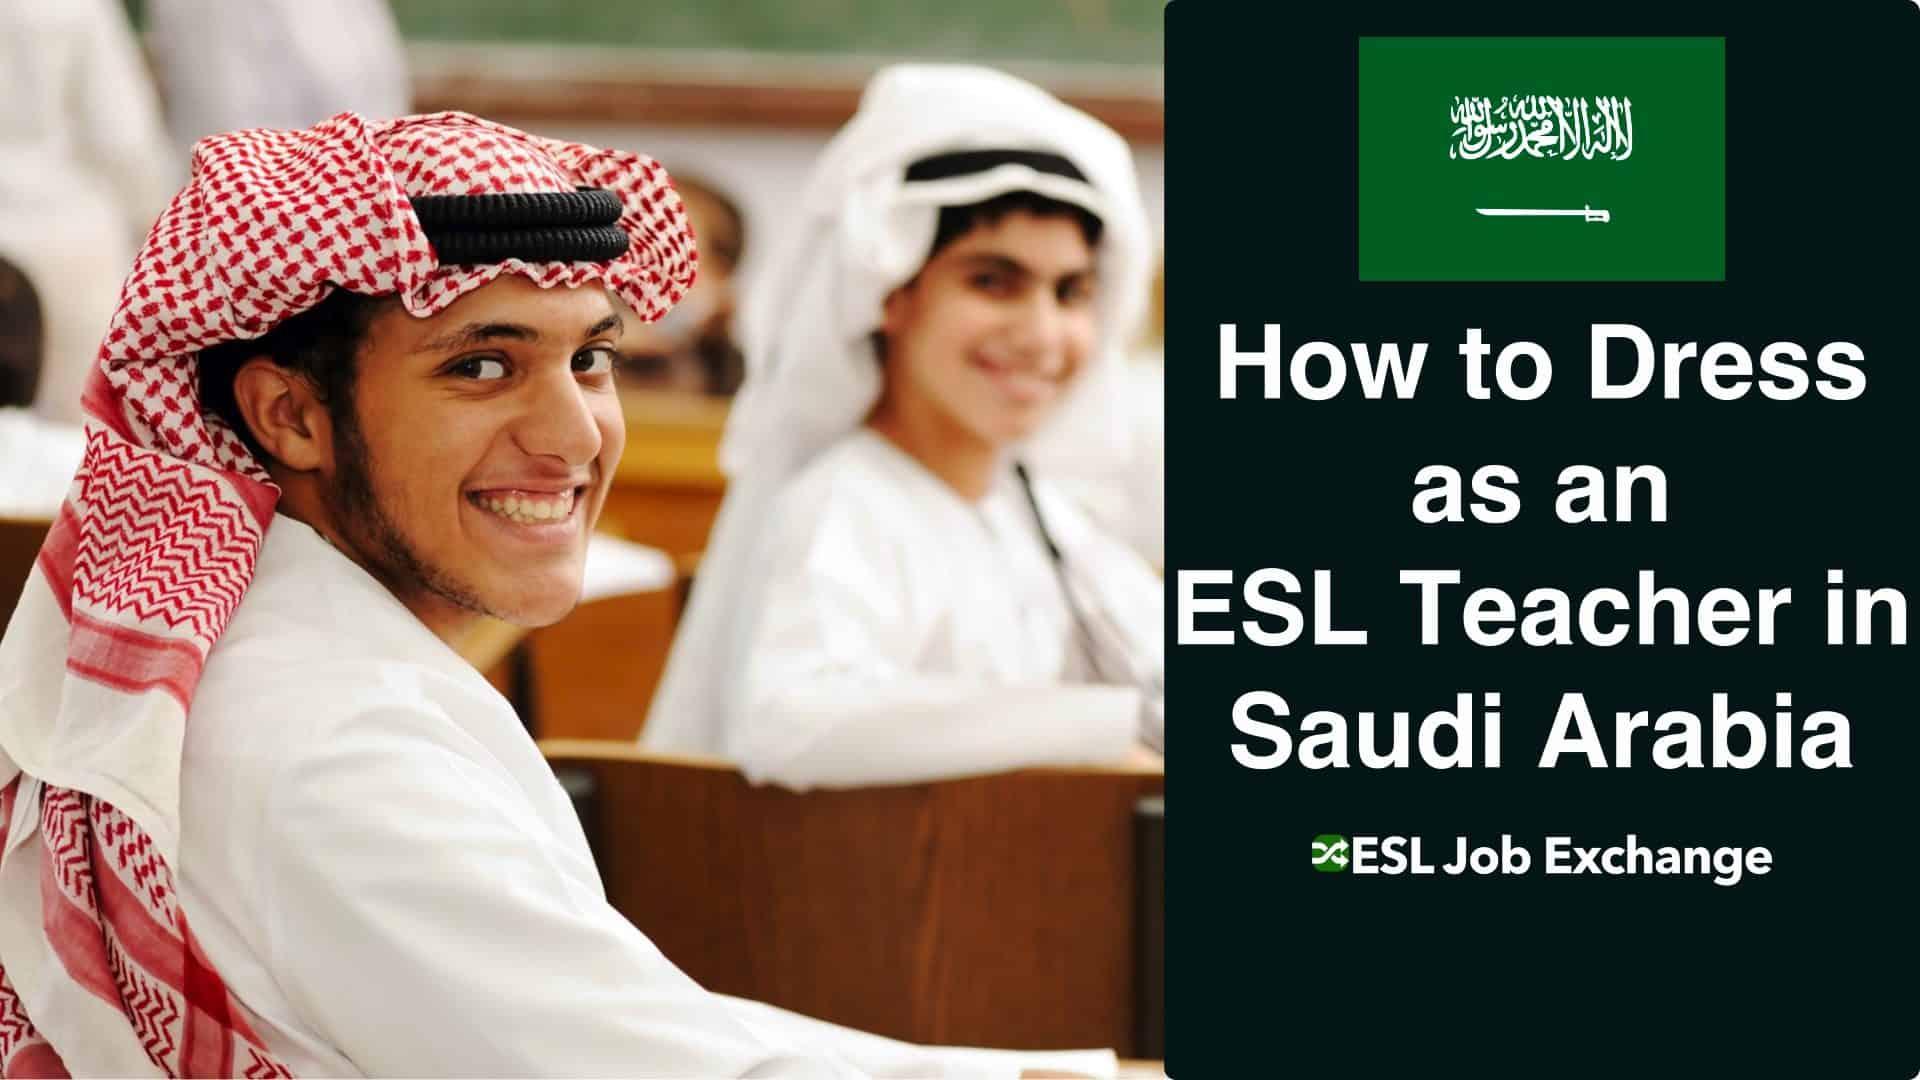 How To Dress Esl Teacher Saudi Arabia